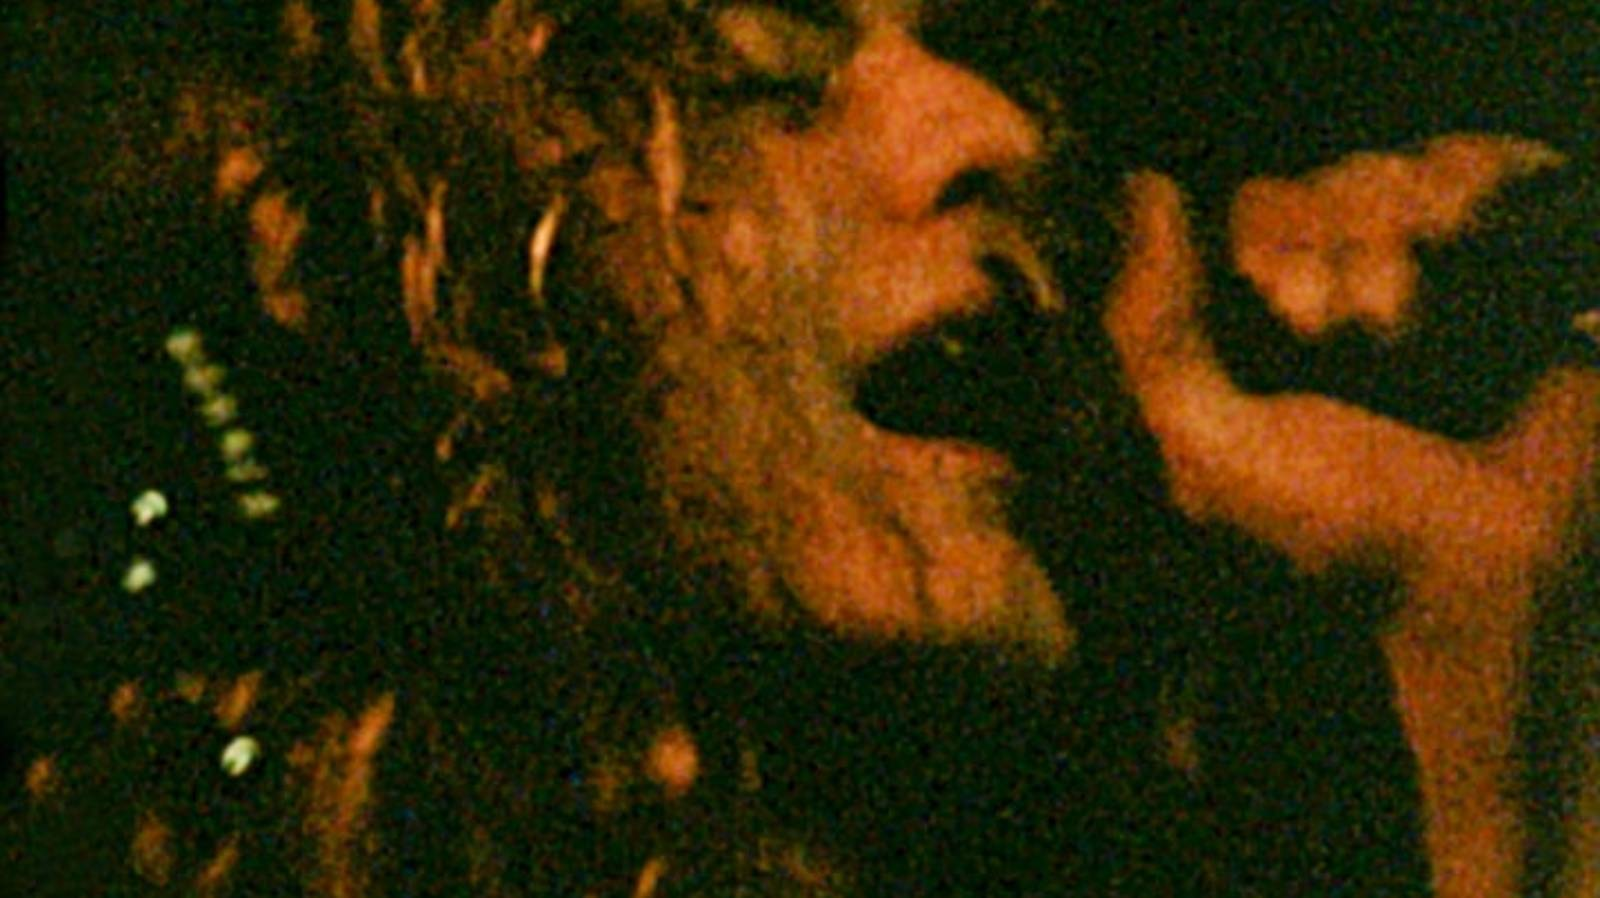 Fan finds Led Zeppelin Auckland concert film in shed